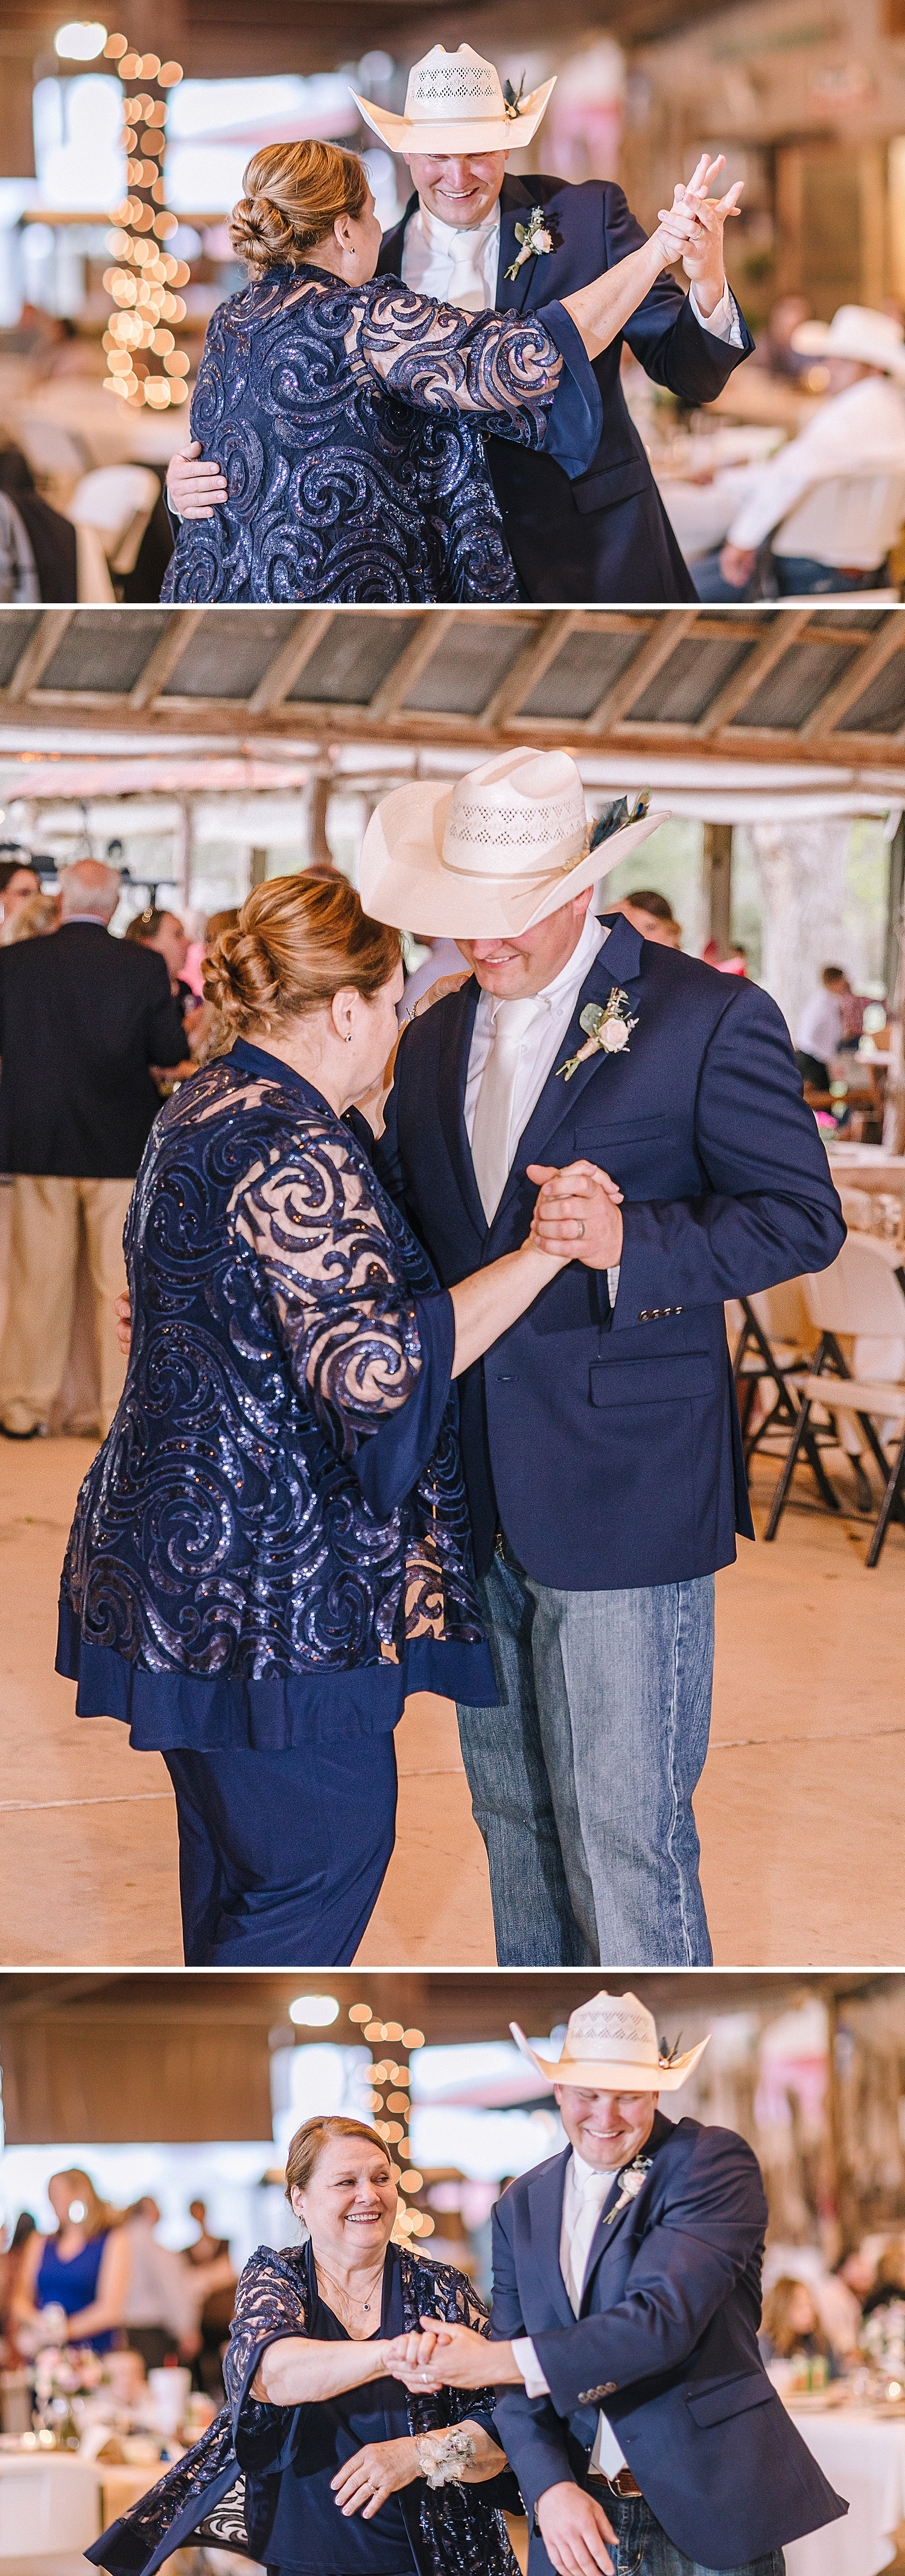 Rio-Cibilo-Ranch-Marion-Texas-Wedding-Rustic-Blush-Rose-Quartz-Details-Carly-Barton-Photography_0083.jpg